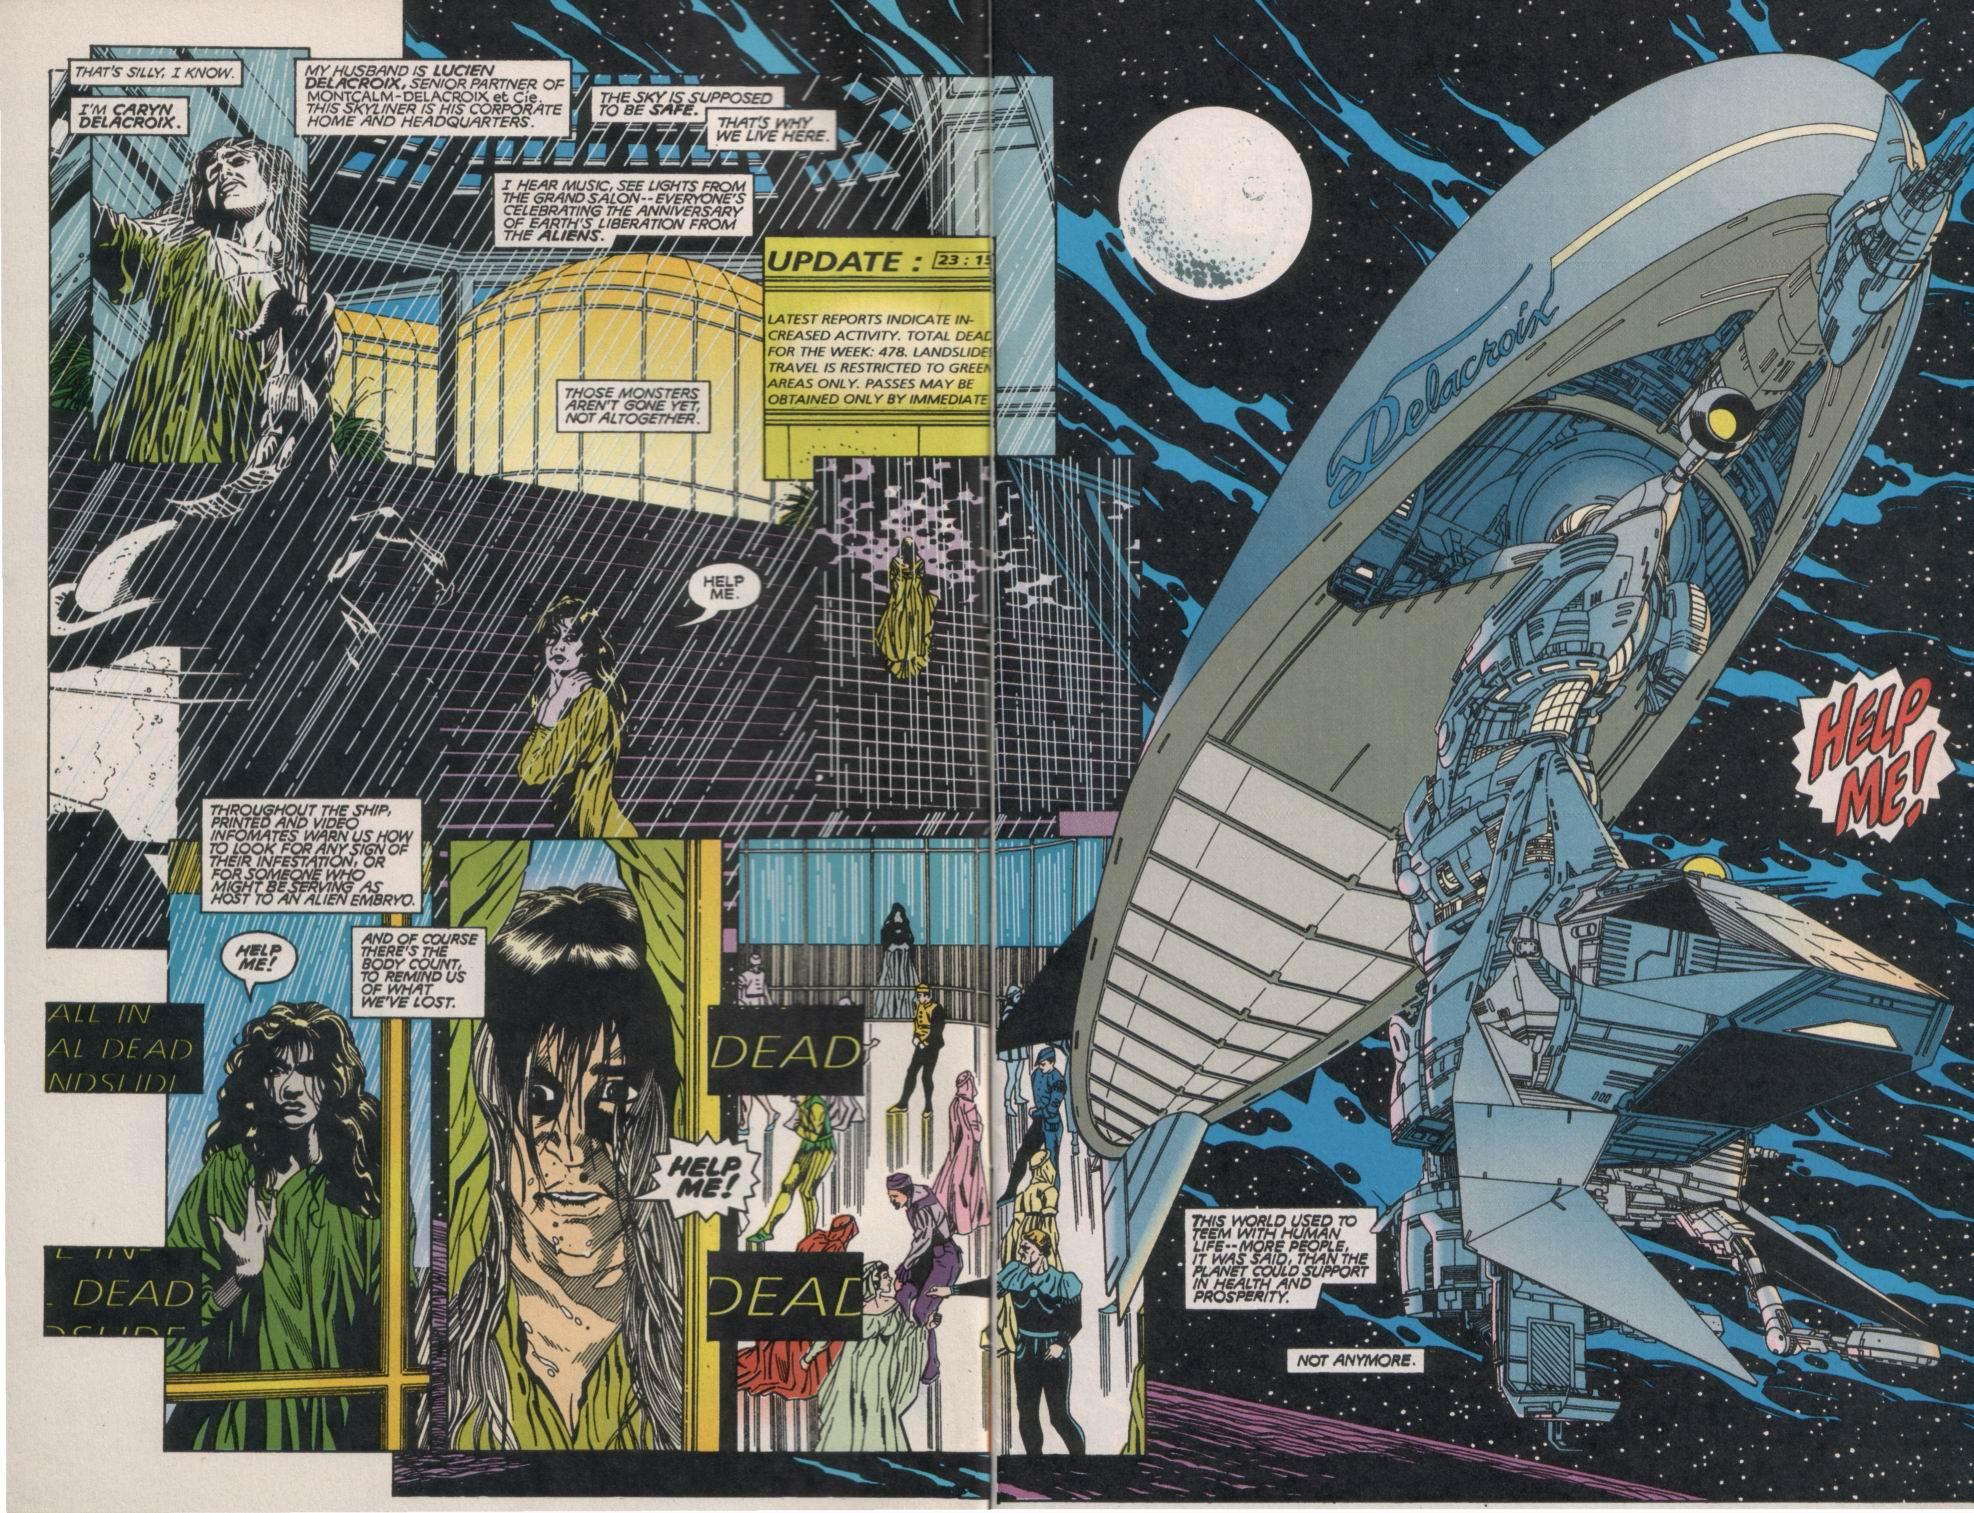 Read online Aliens/Predator: The Deadliest of the Species comic -  Issue #1 - 4